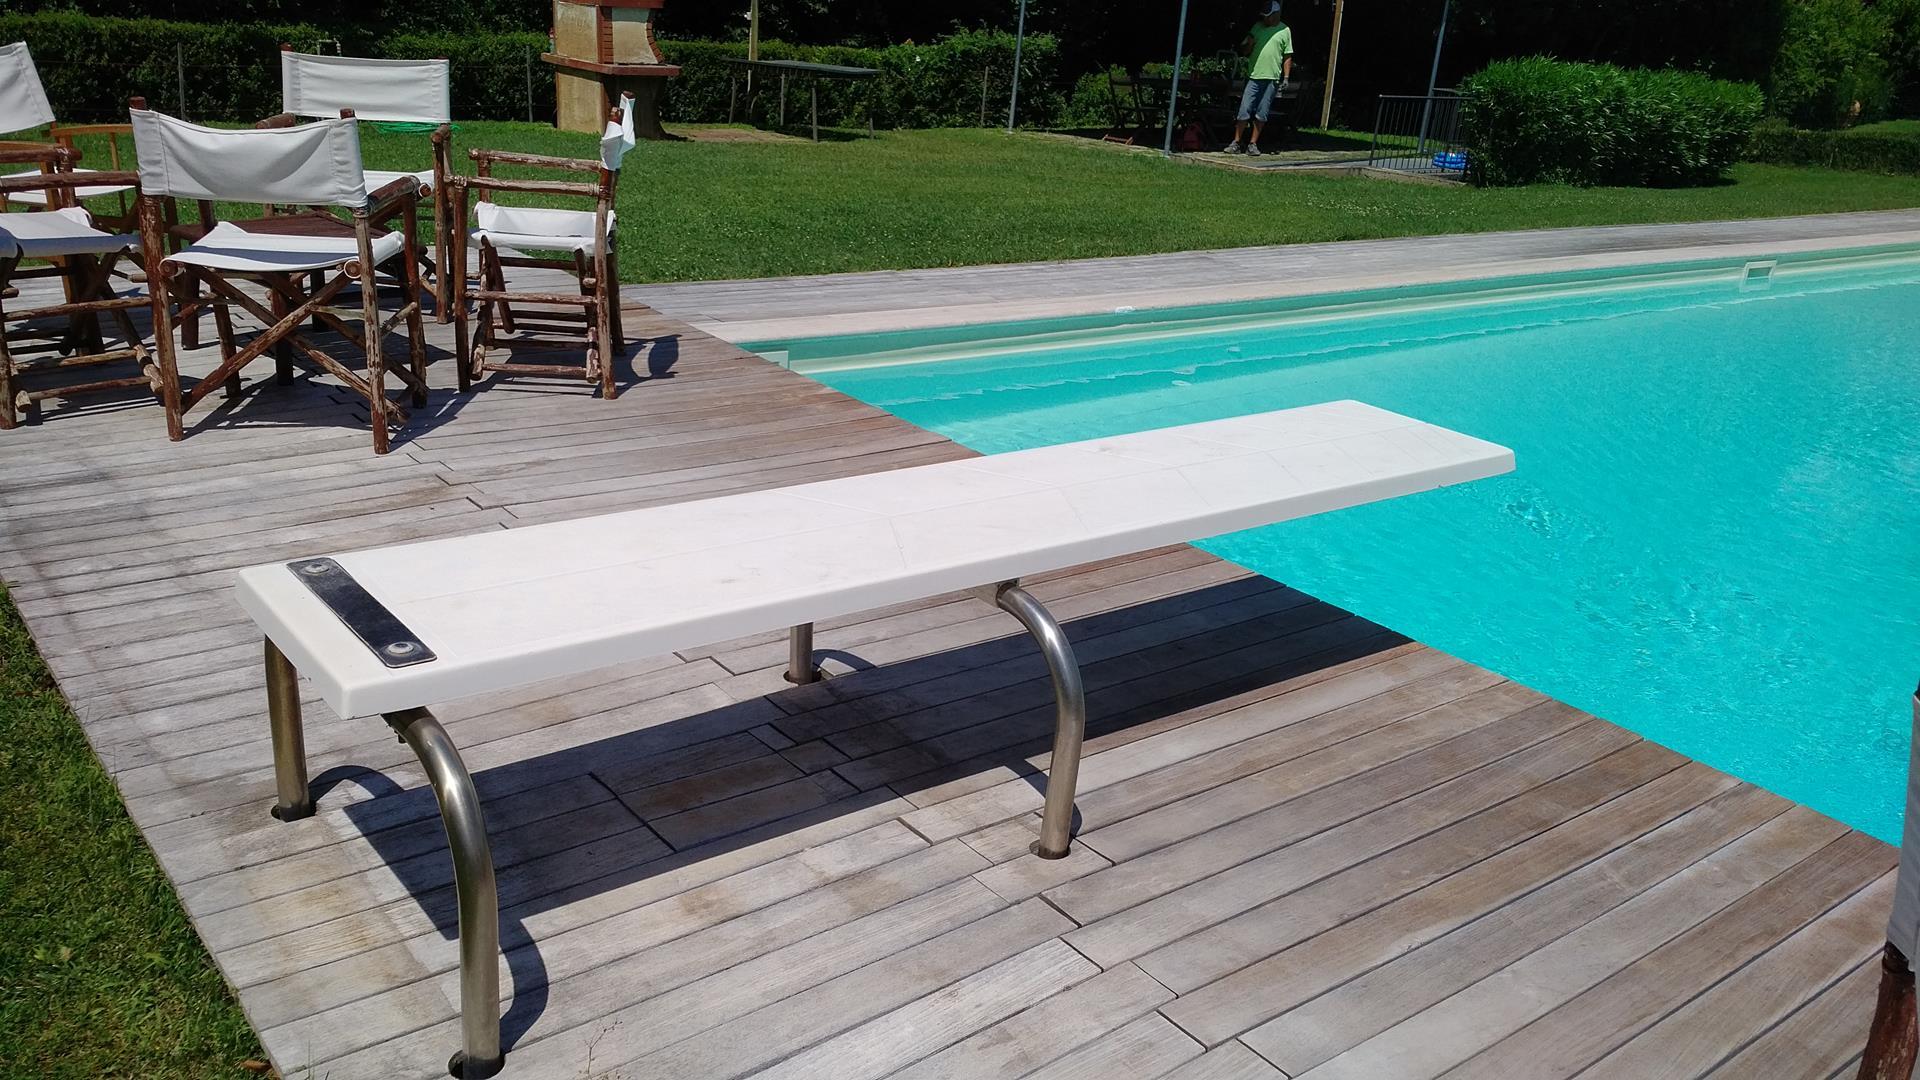 trampolini-per-piscine-3